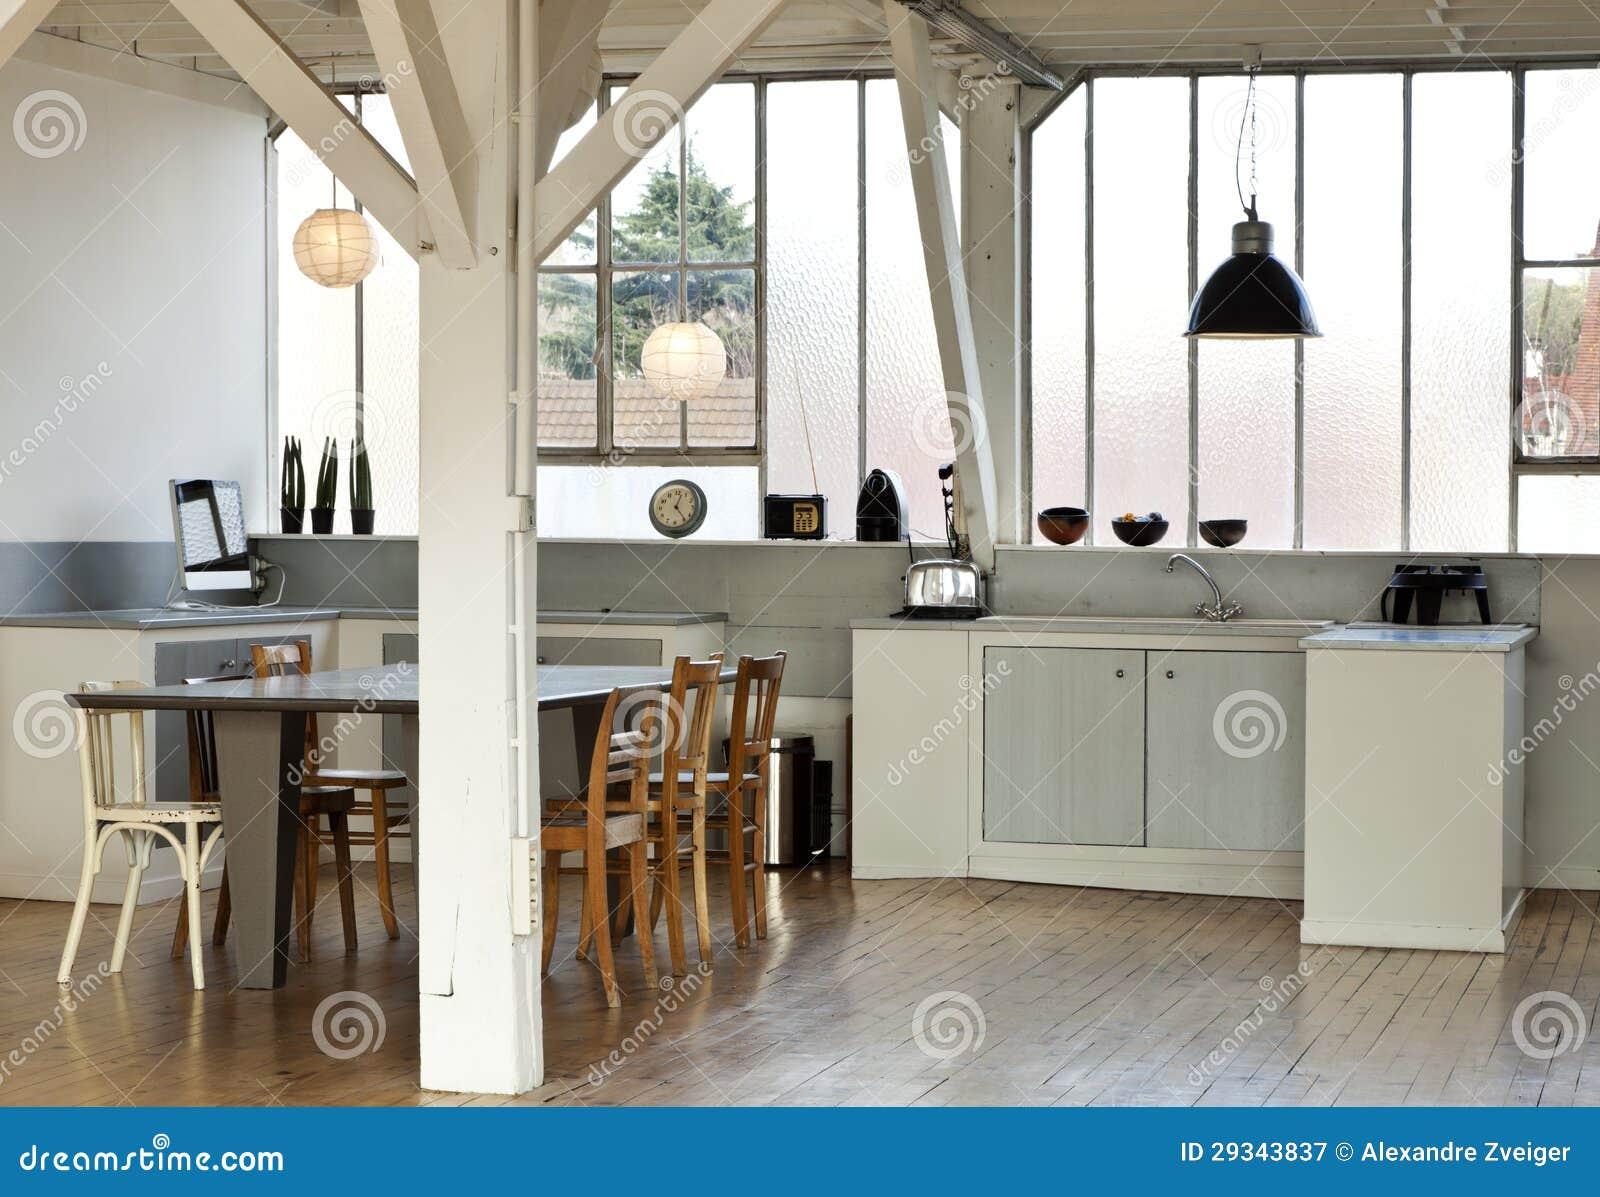 Loft Kitchen Interior Loft Kitchen Royalty Free Stock Photography Image